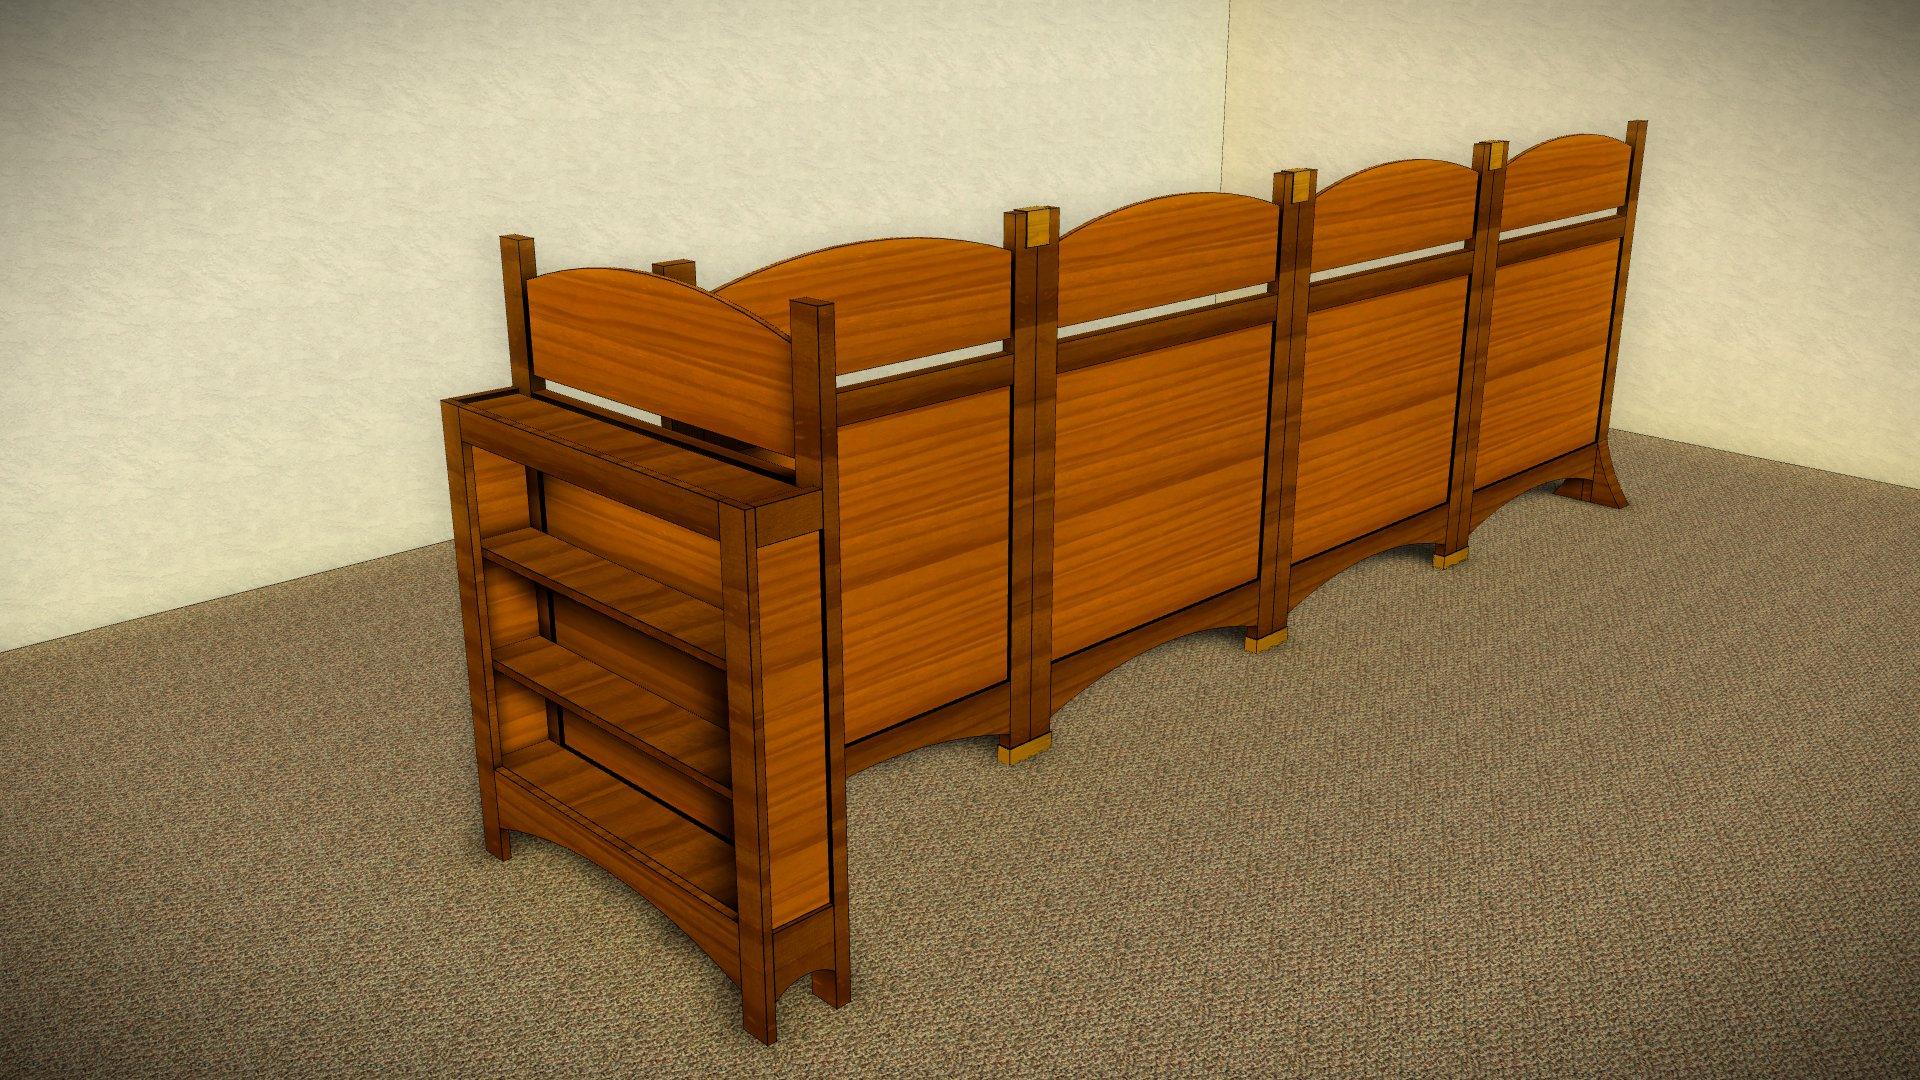 mechitza design with wood panels